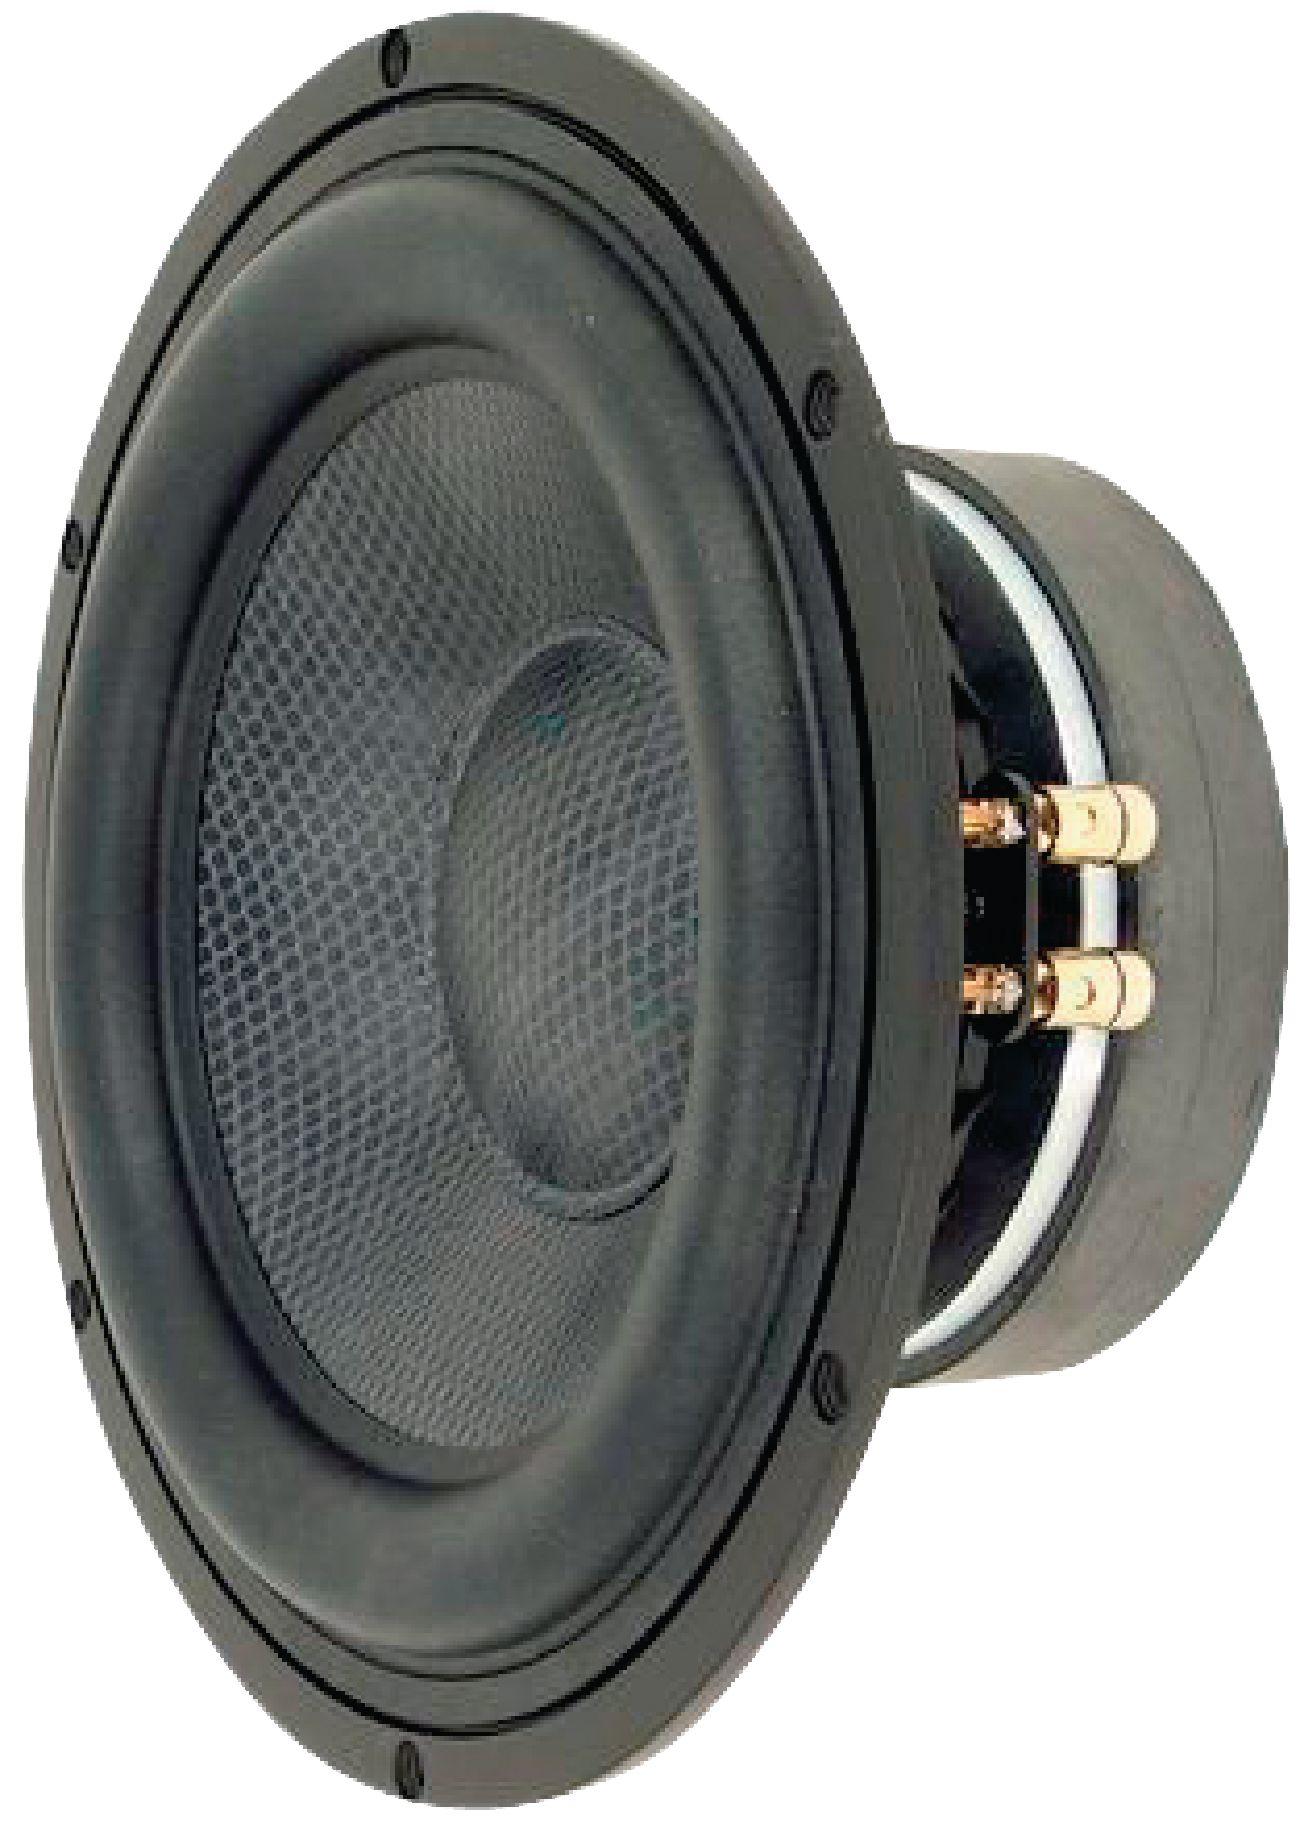 Basový reproduktor 8 Ohm 300 W Visaton, VS-TIW250XS